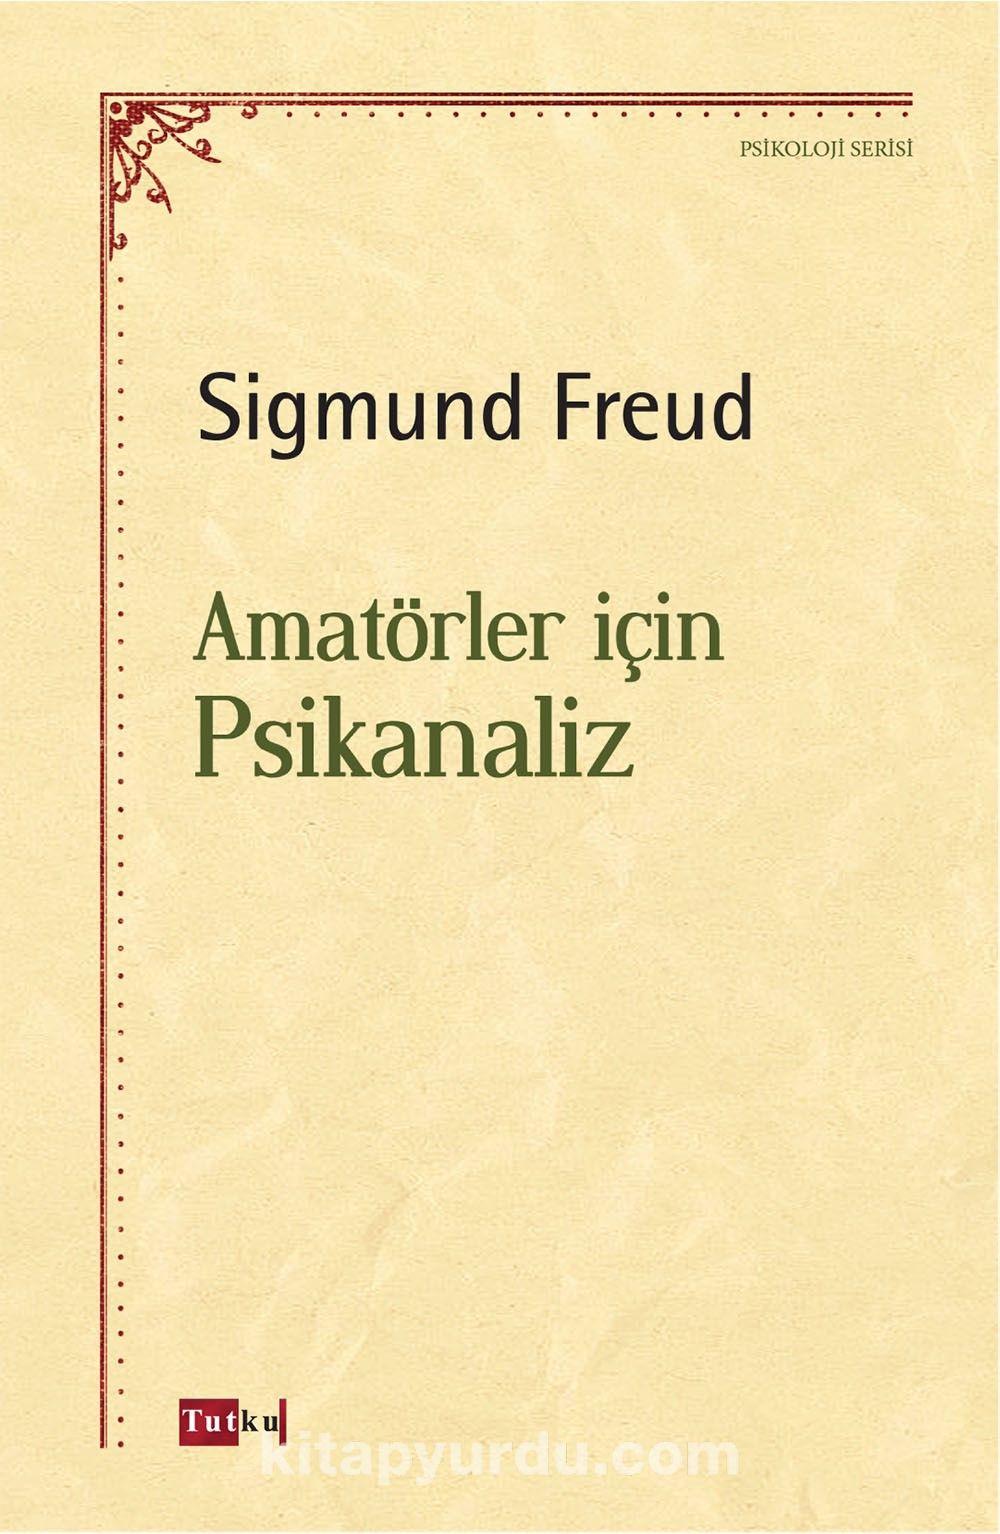 Amatörler İçin Psikanaliz - Sigmund Freud pdf epub